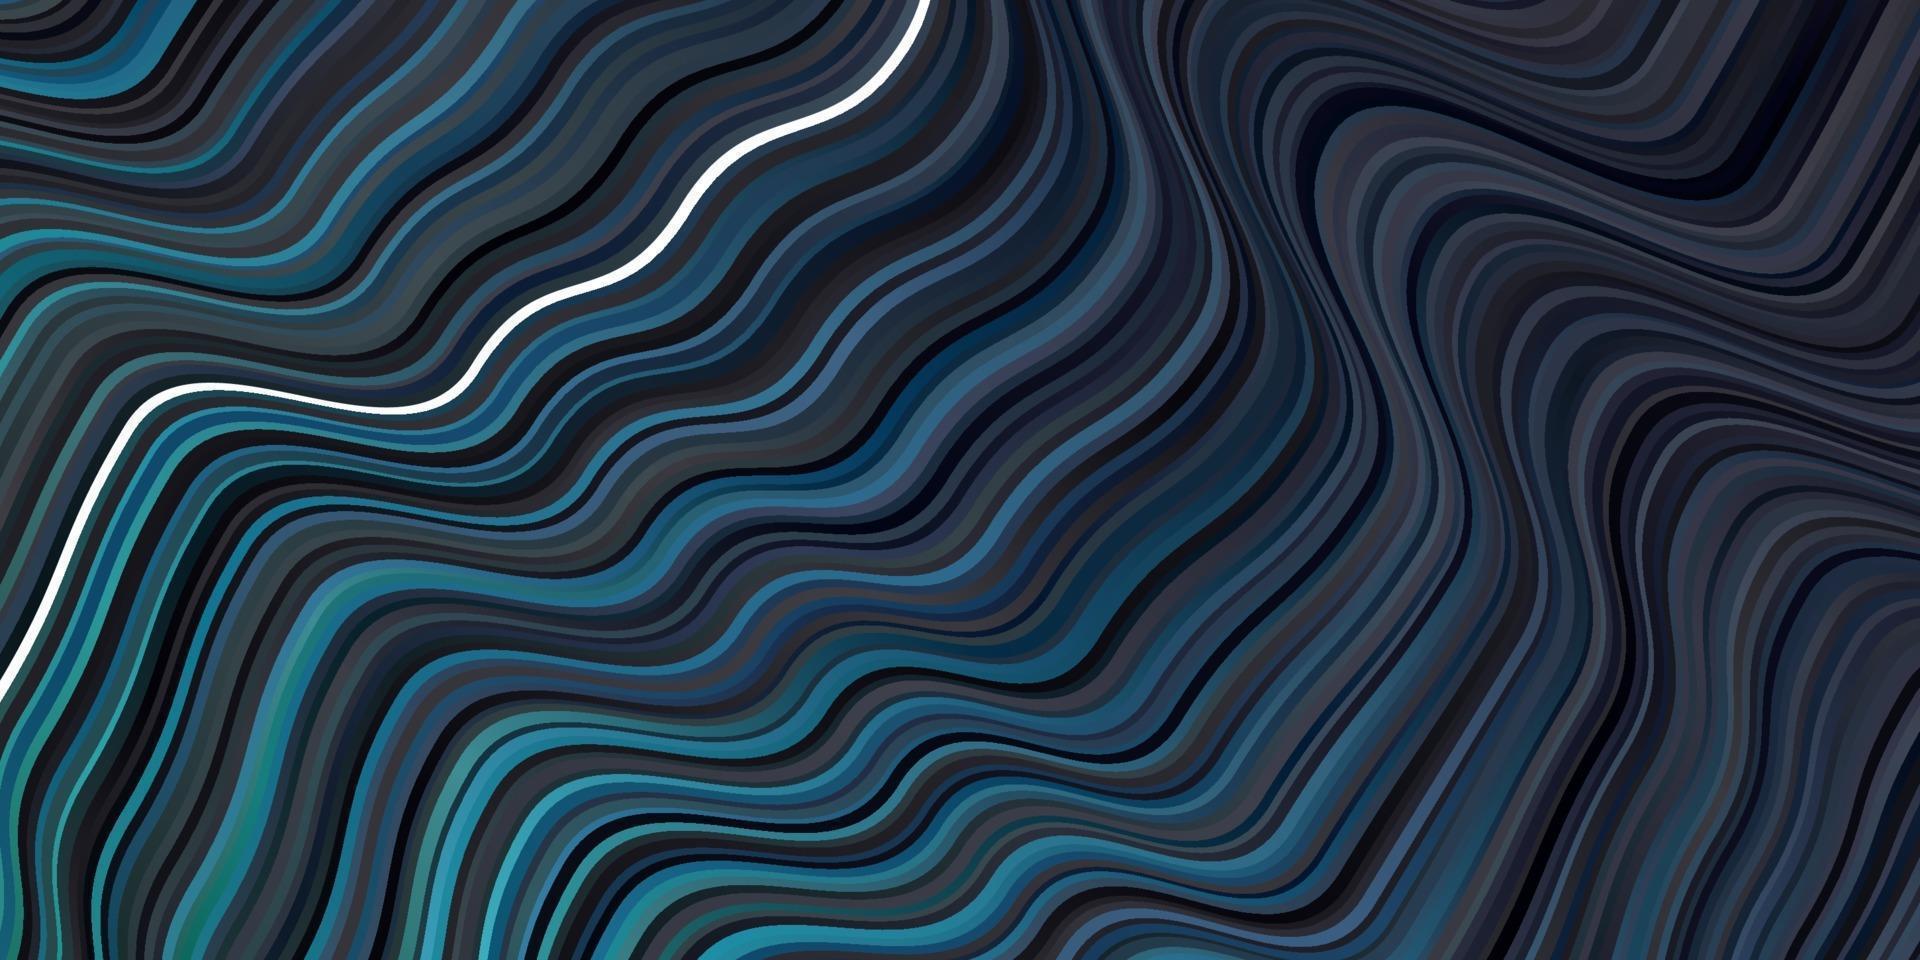 layout de vetor de azul escuro e verde com curvas.